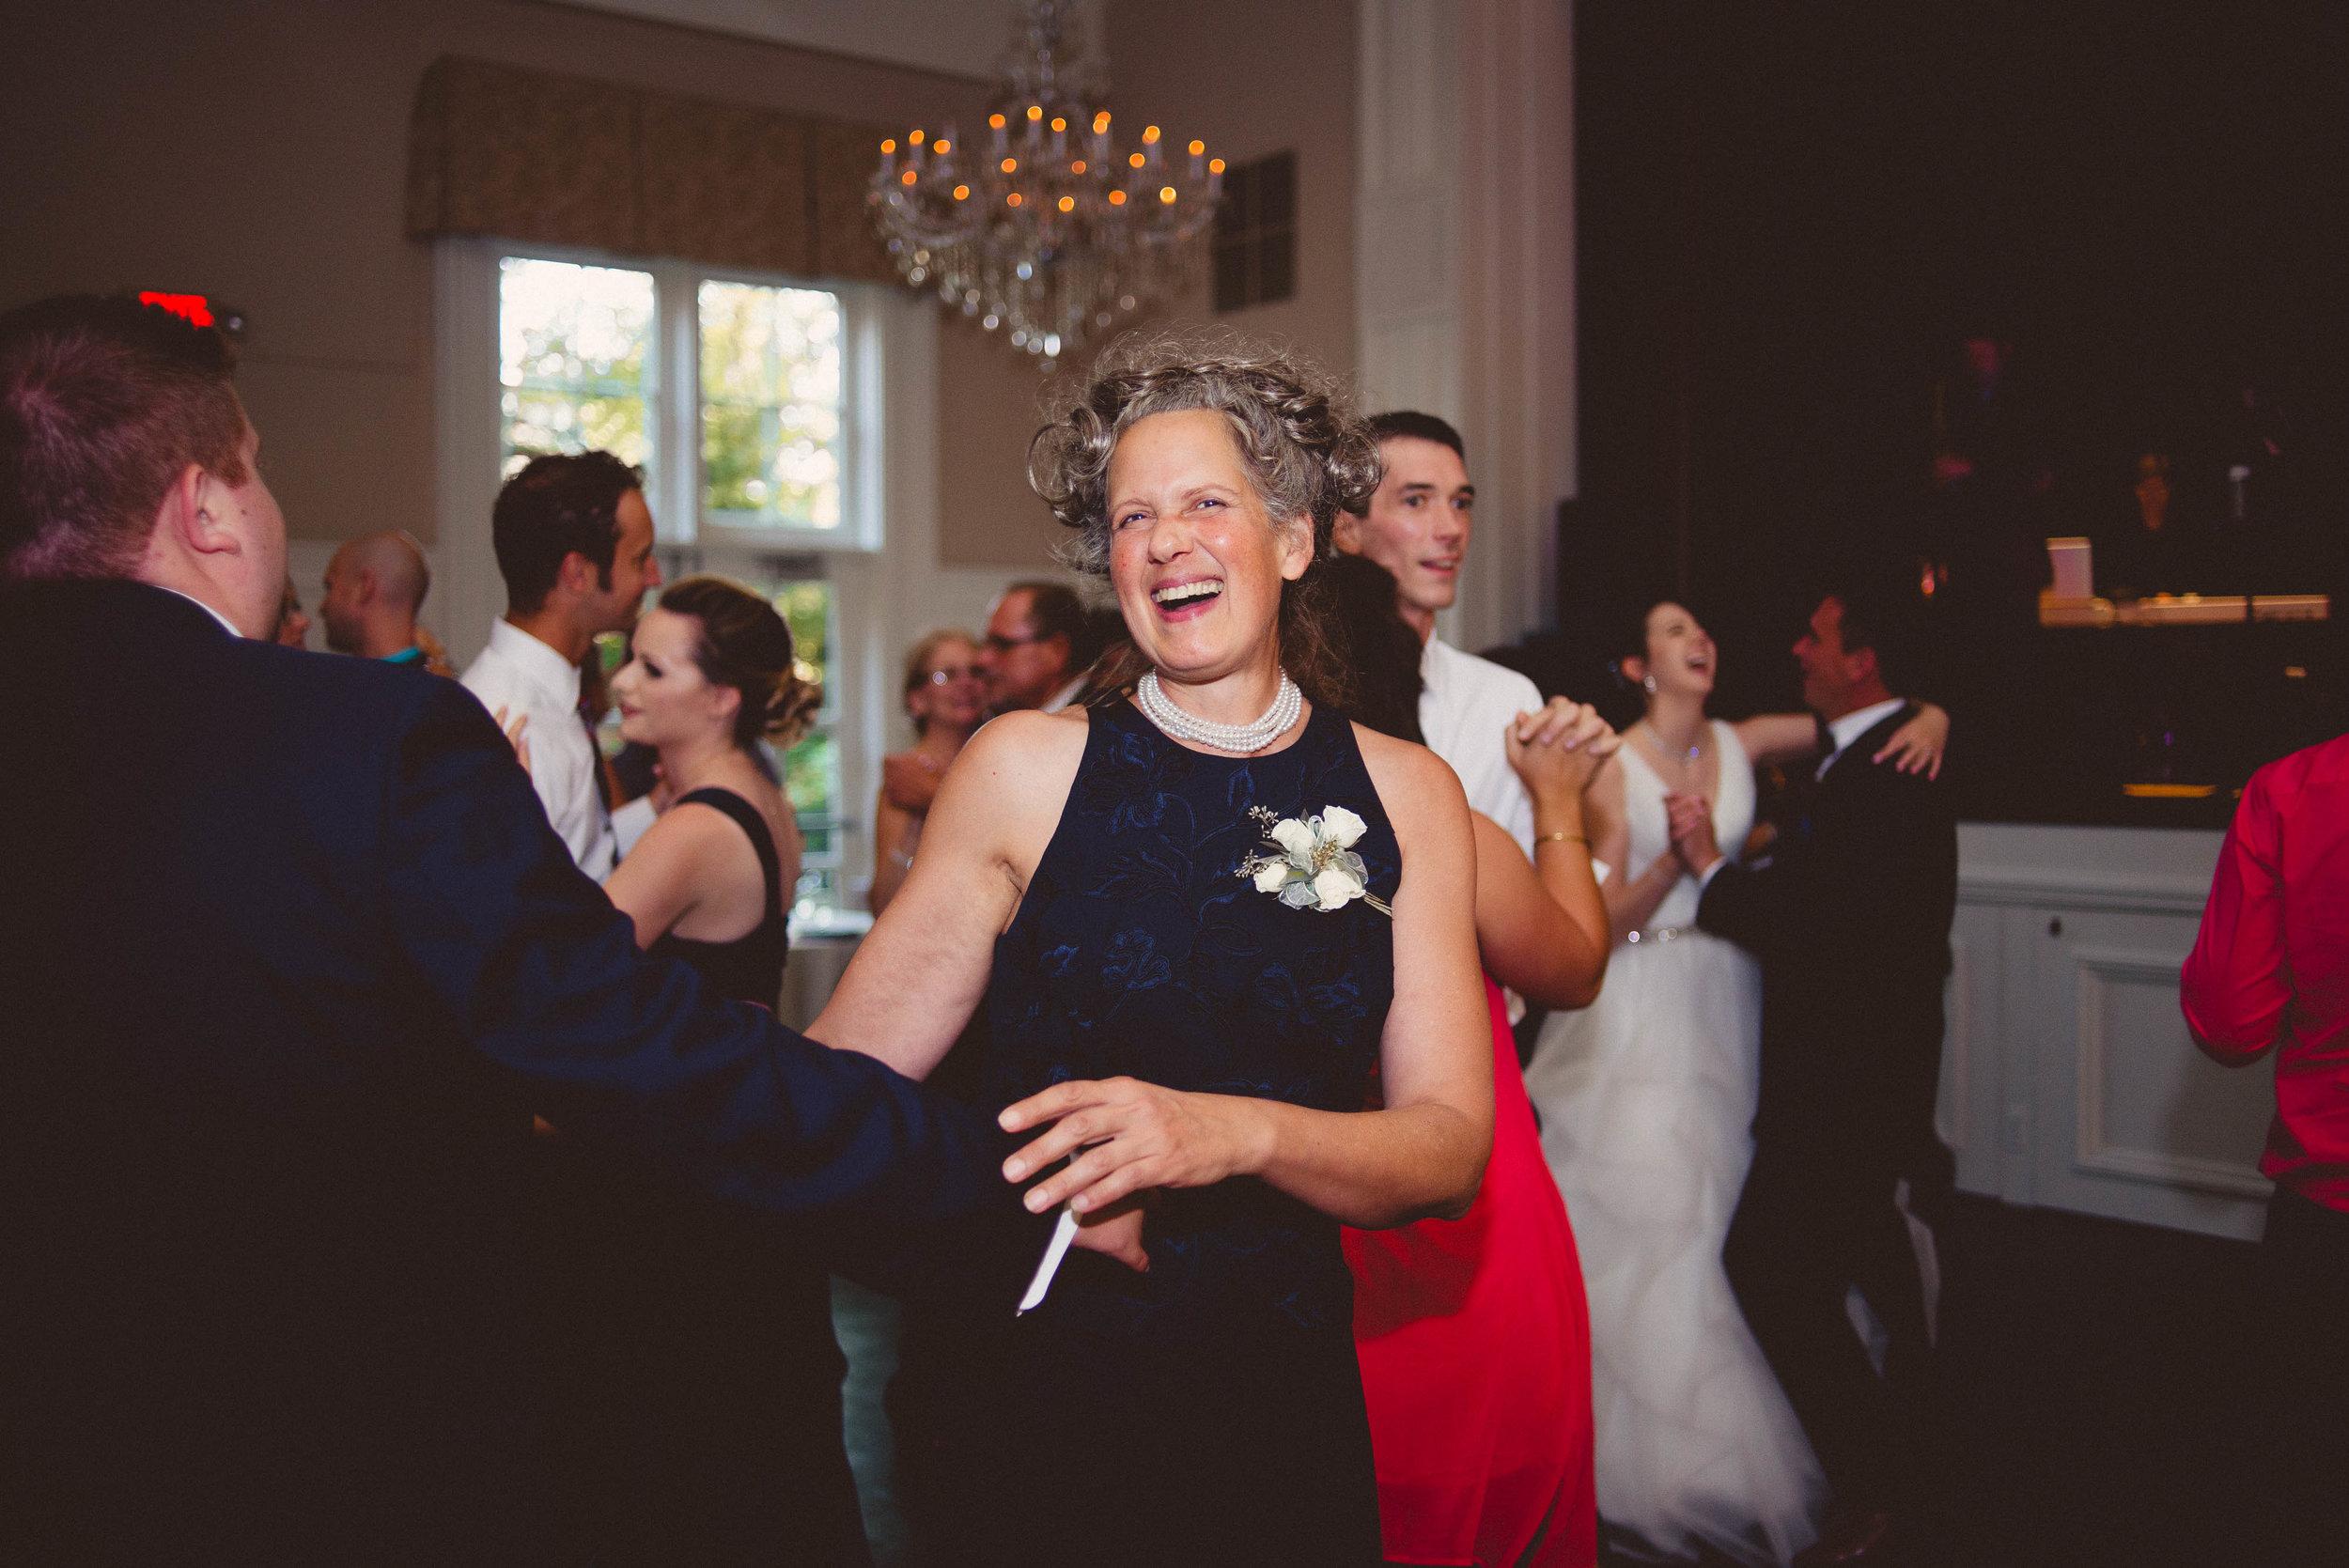 Kara and Mike Wedding-20160904-19-19-54.jpg